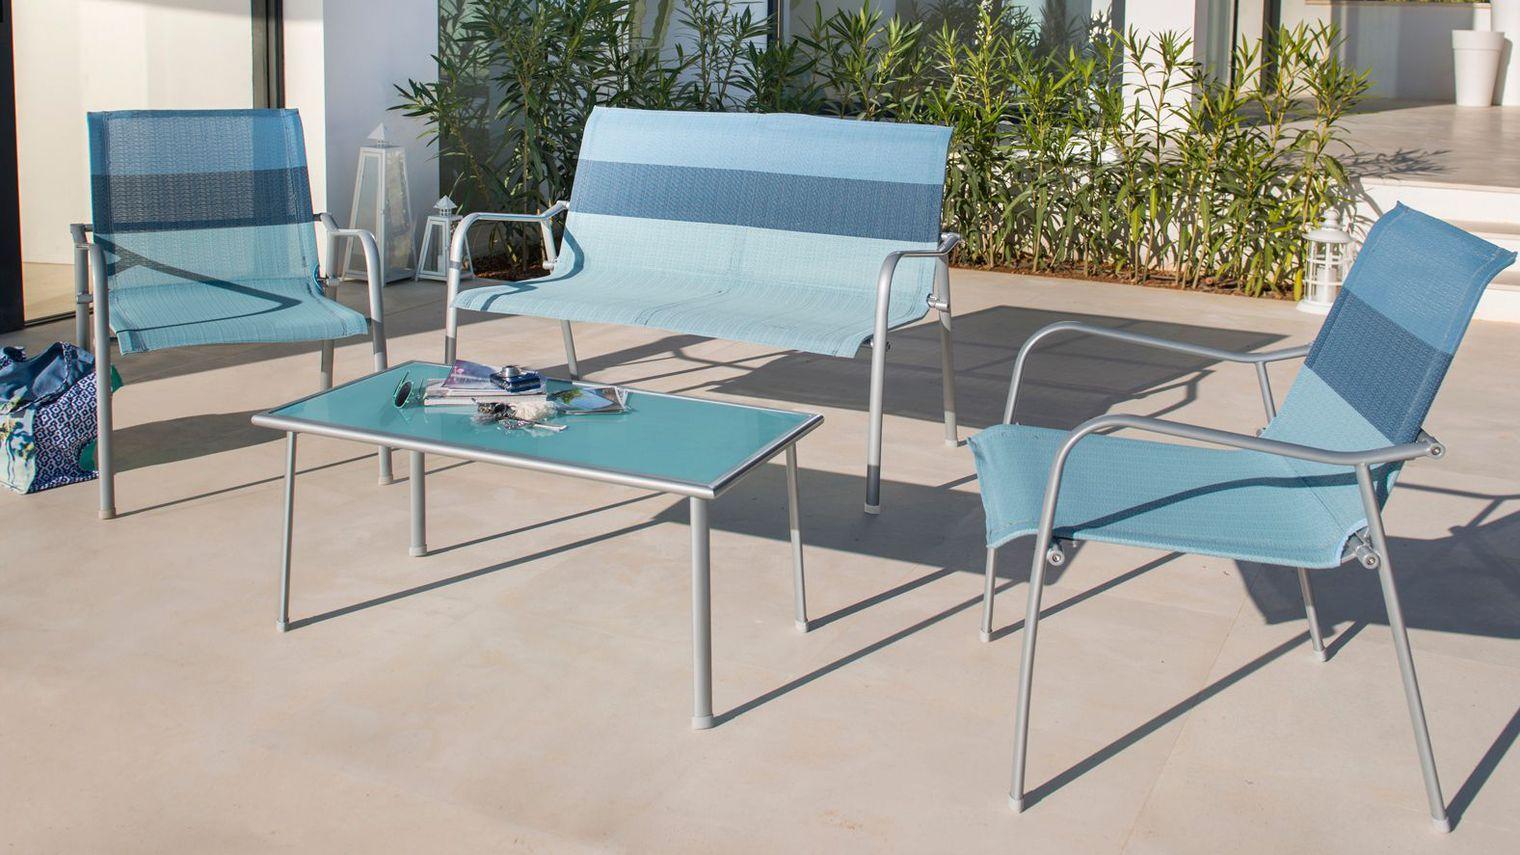 Salon de jardin table en verre pas cher - Mailleraye.fr jardin